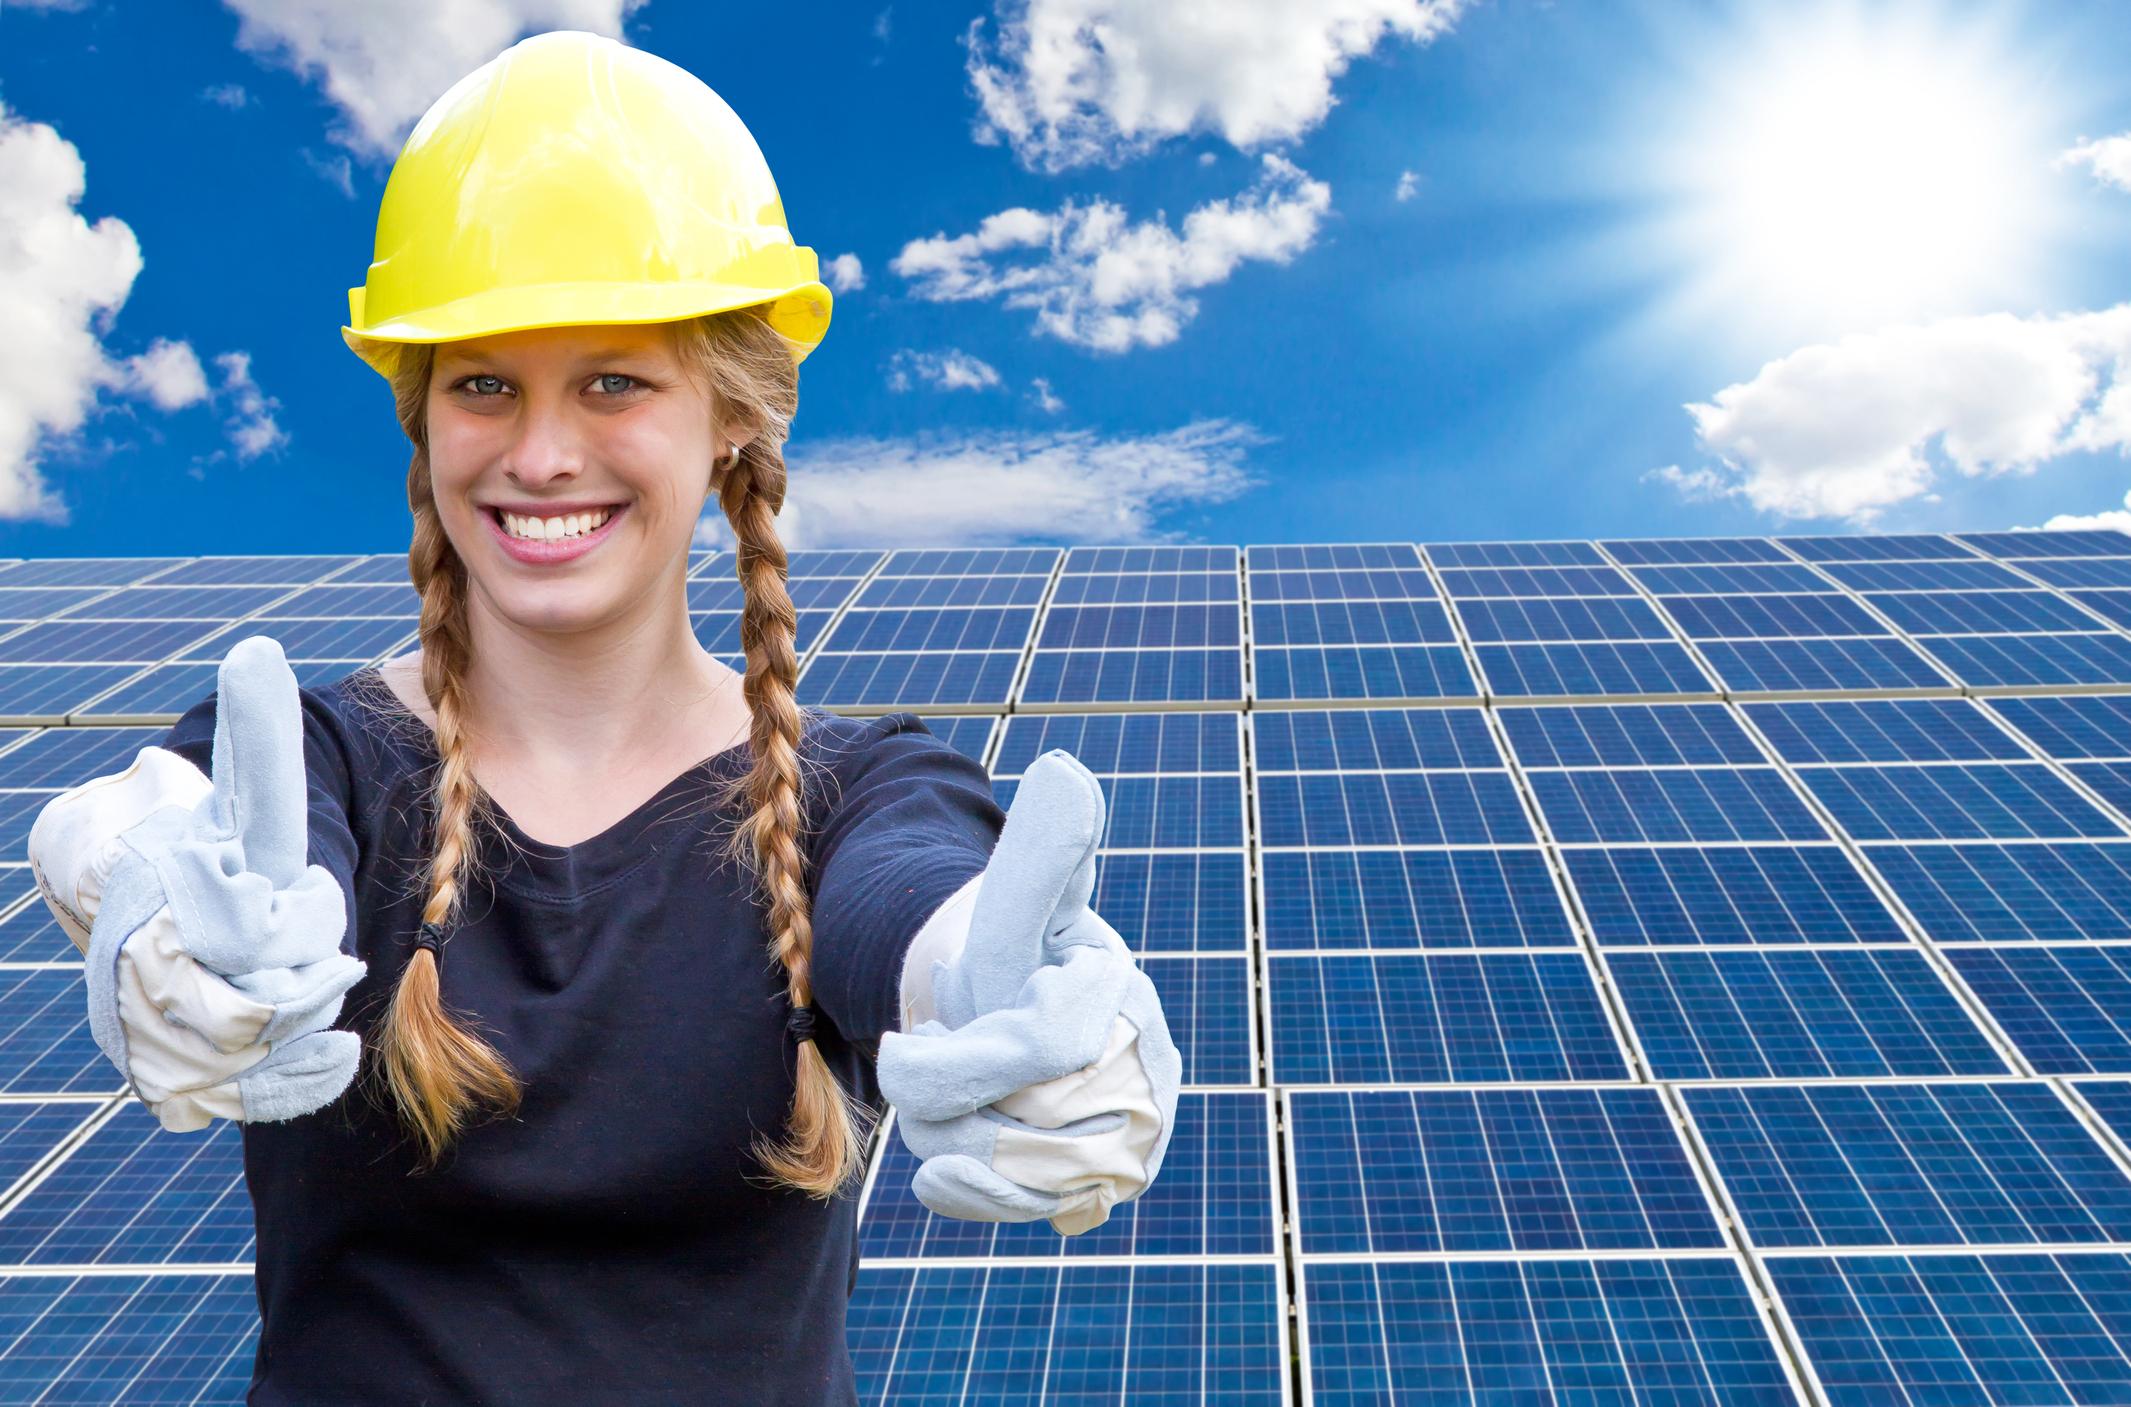 PHC0521_student-with-solar-panels.jpg